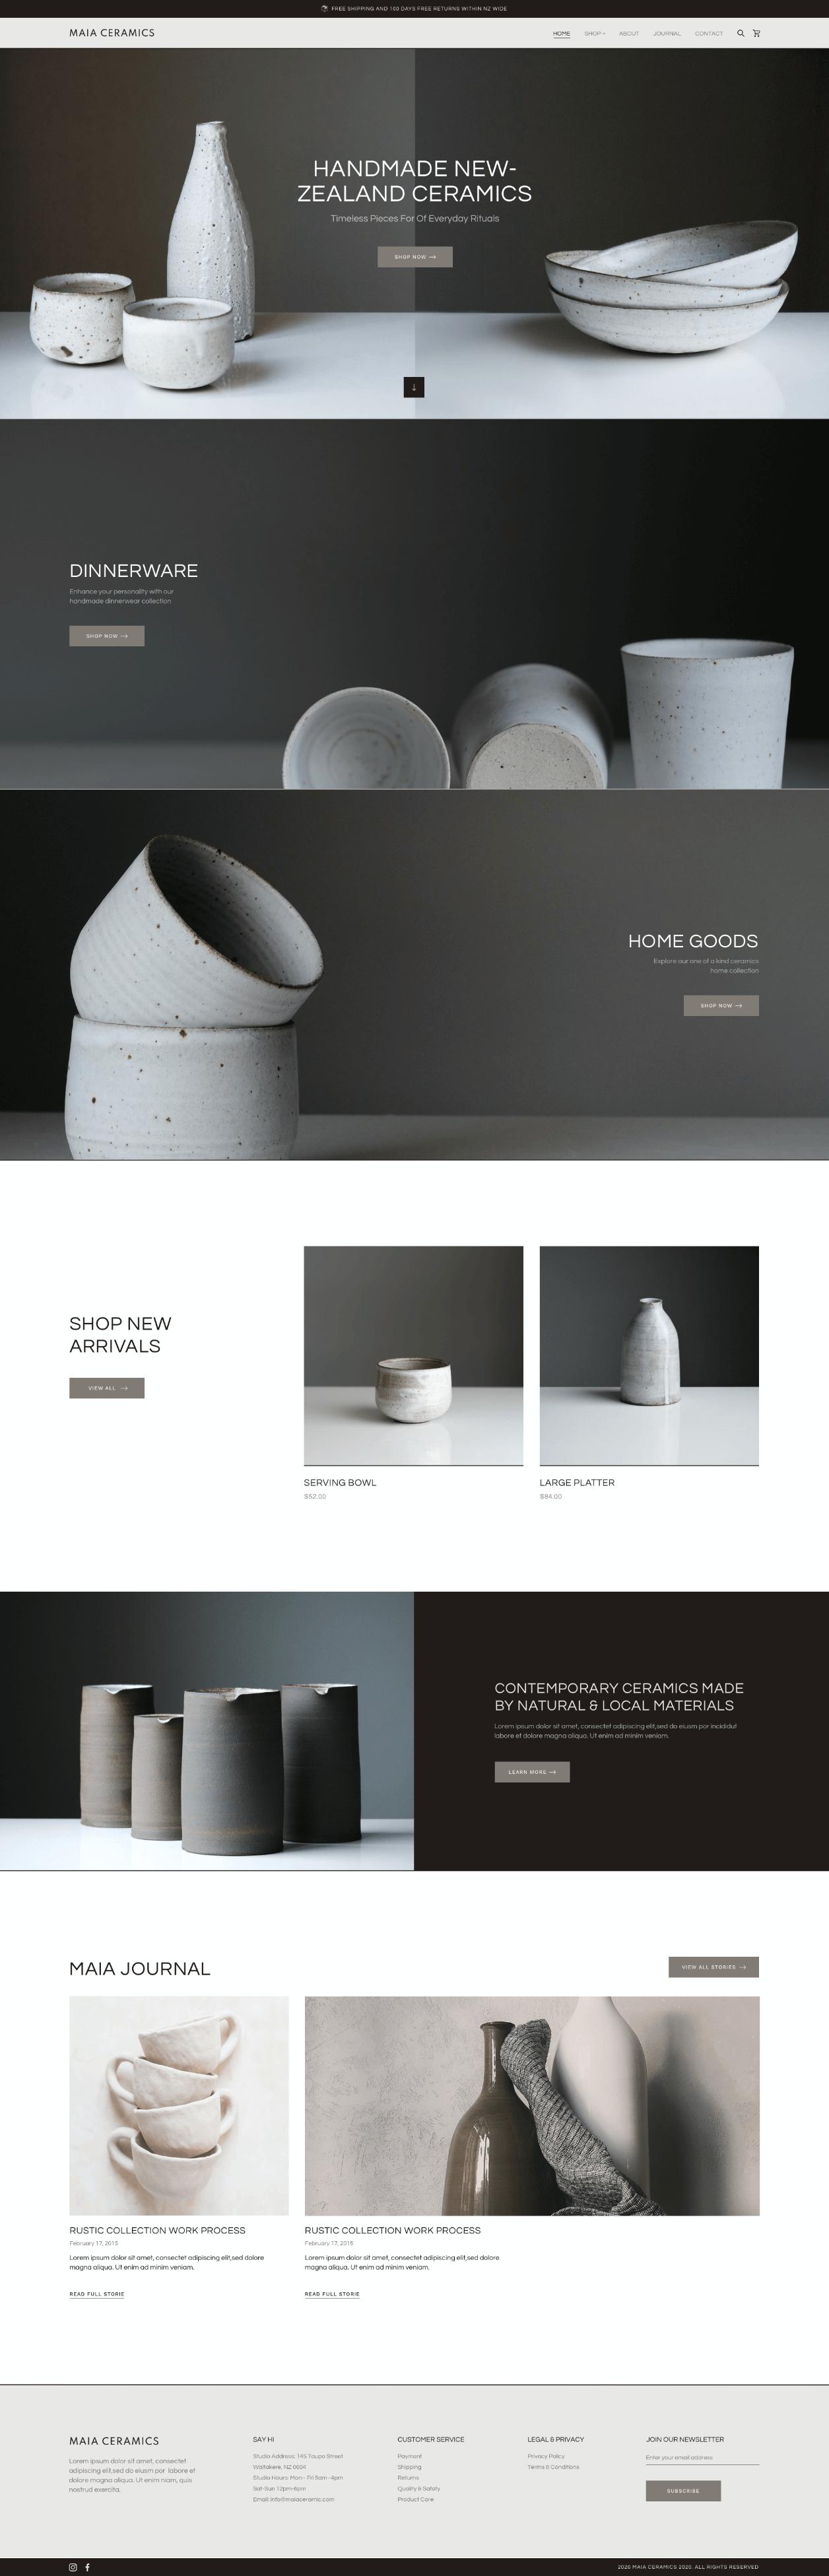 Screenshot of website designed by Mark Gerkules.